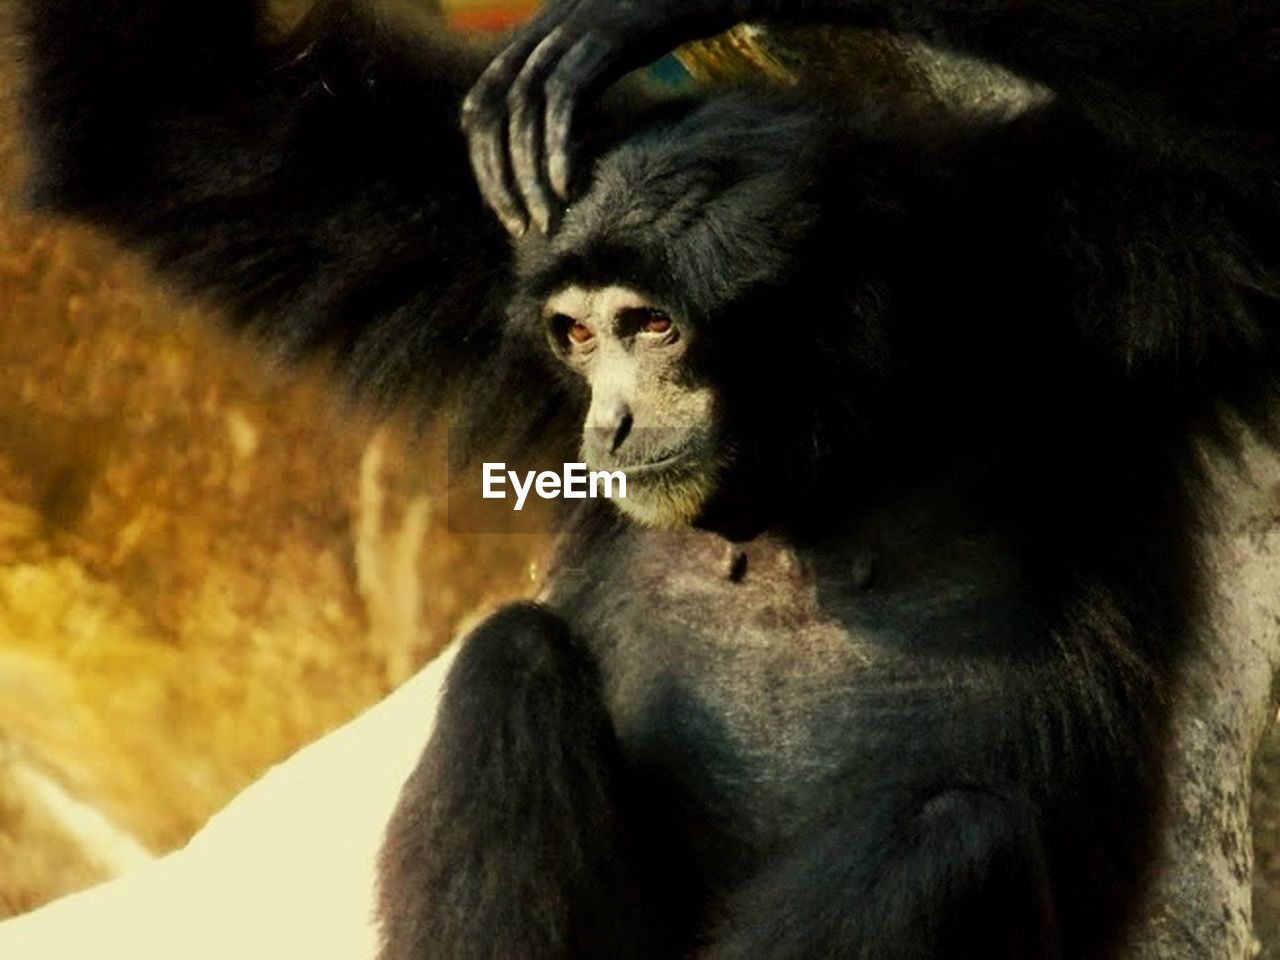 one animal, primate, animal themes, animals in the wild, animal wildlife, mammal, sitting, ape, no people, monkey, gorilla, chimpanzee, day, close-up, outdoors, nature, lemur